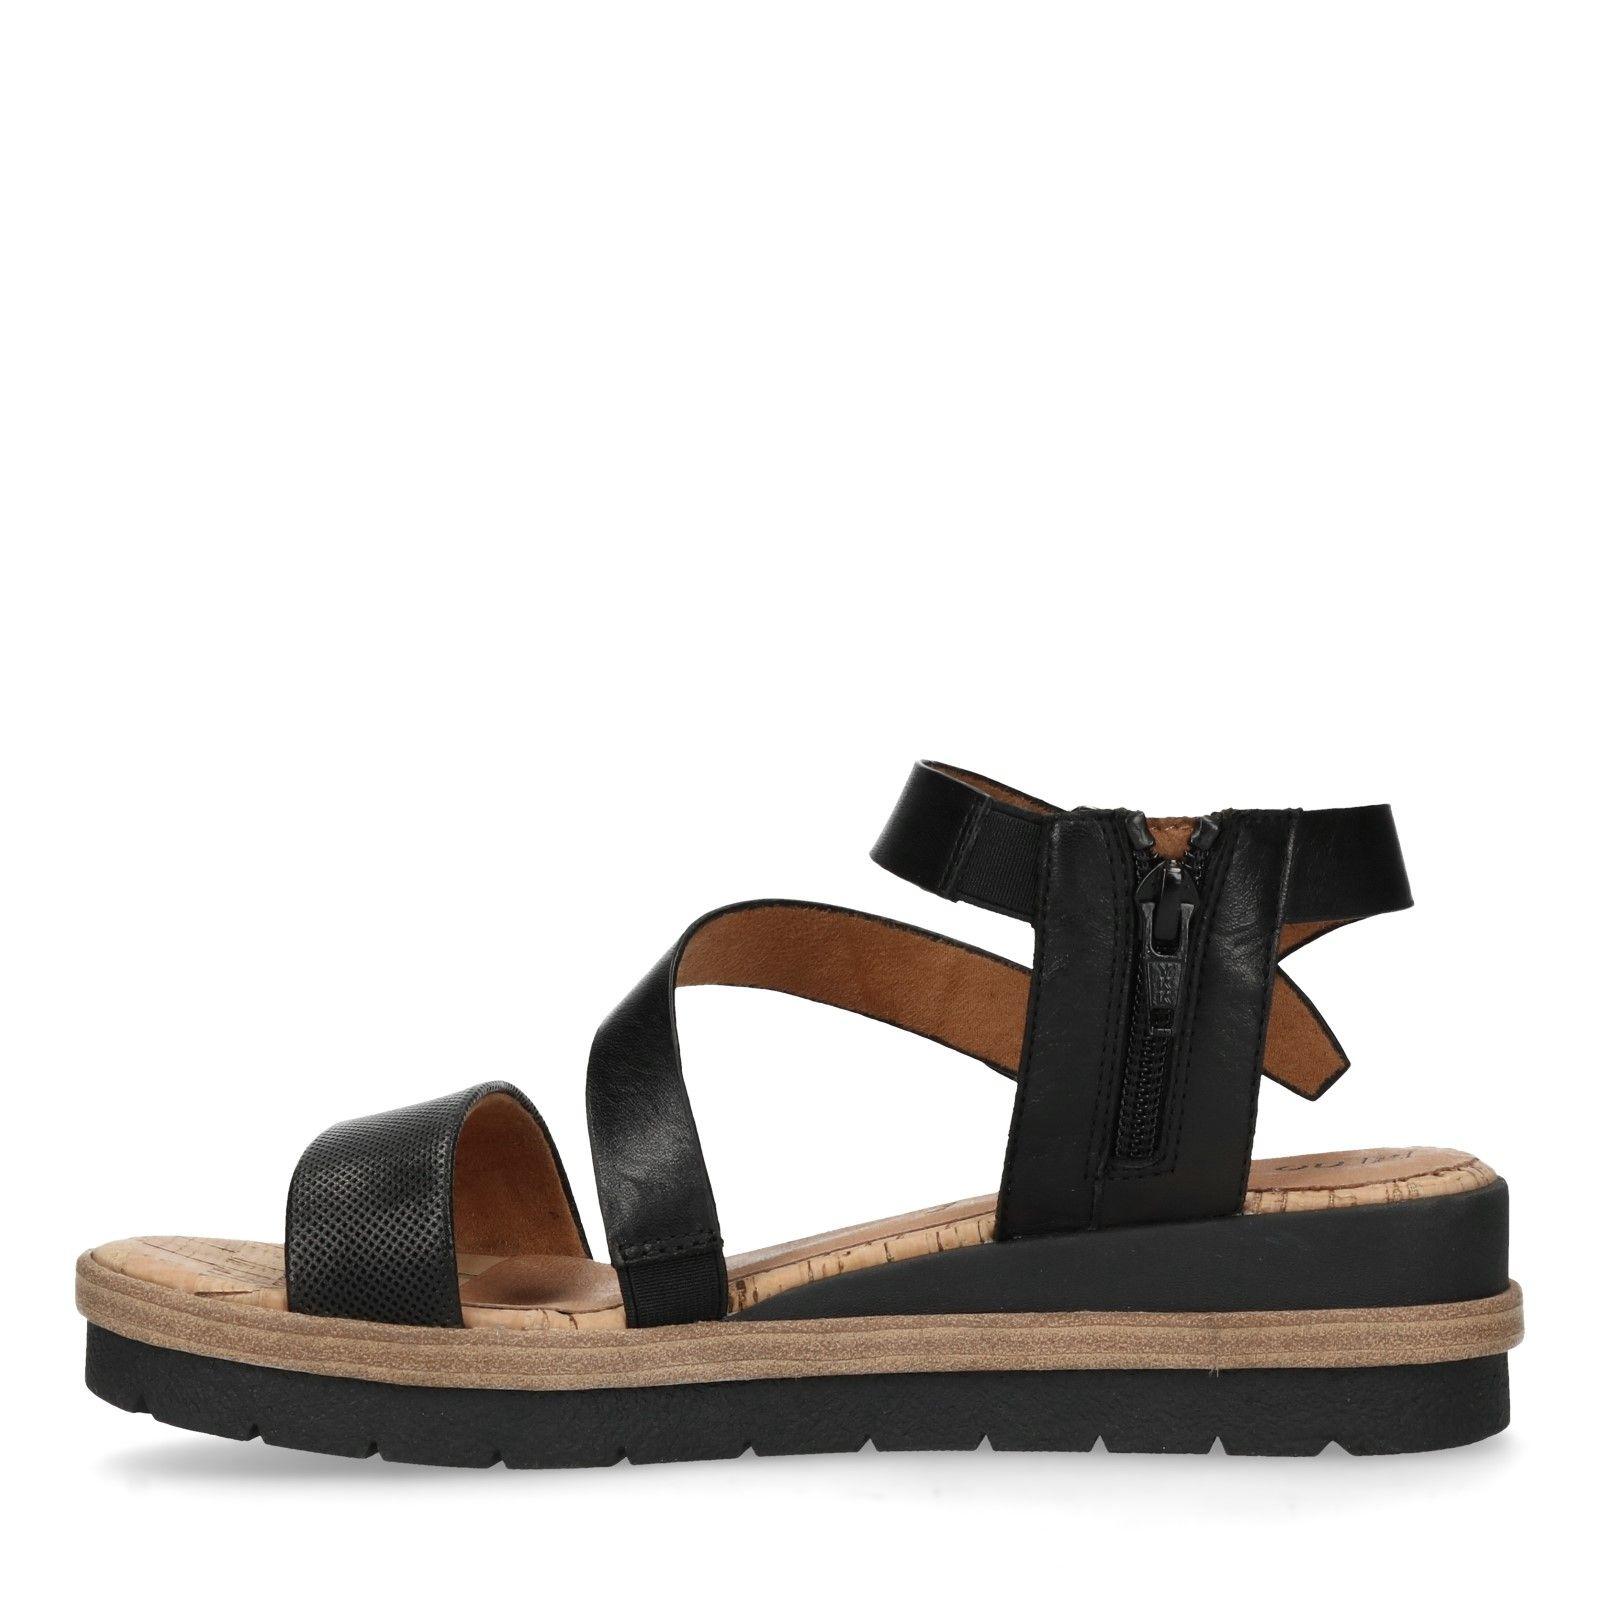 7cc591e0090fbd Zwarte leren sandalen met sleehak - Dames   MANFIELD